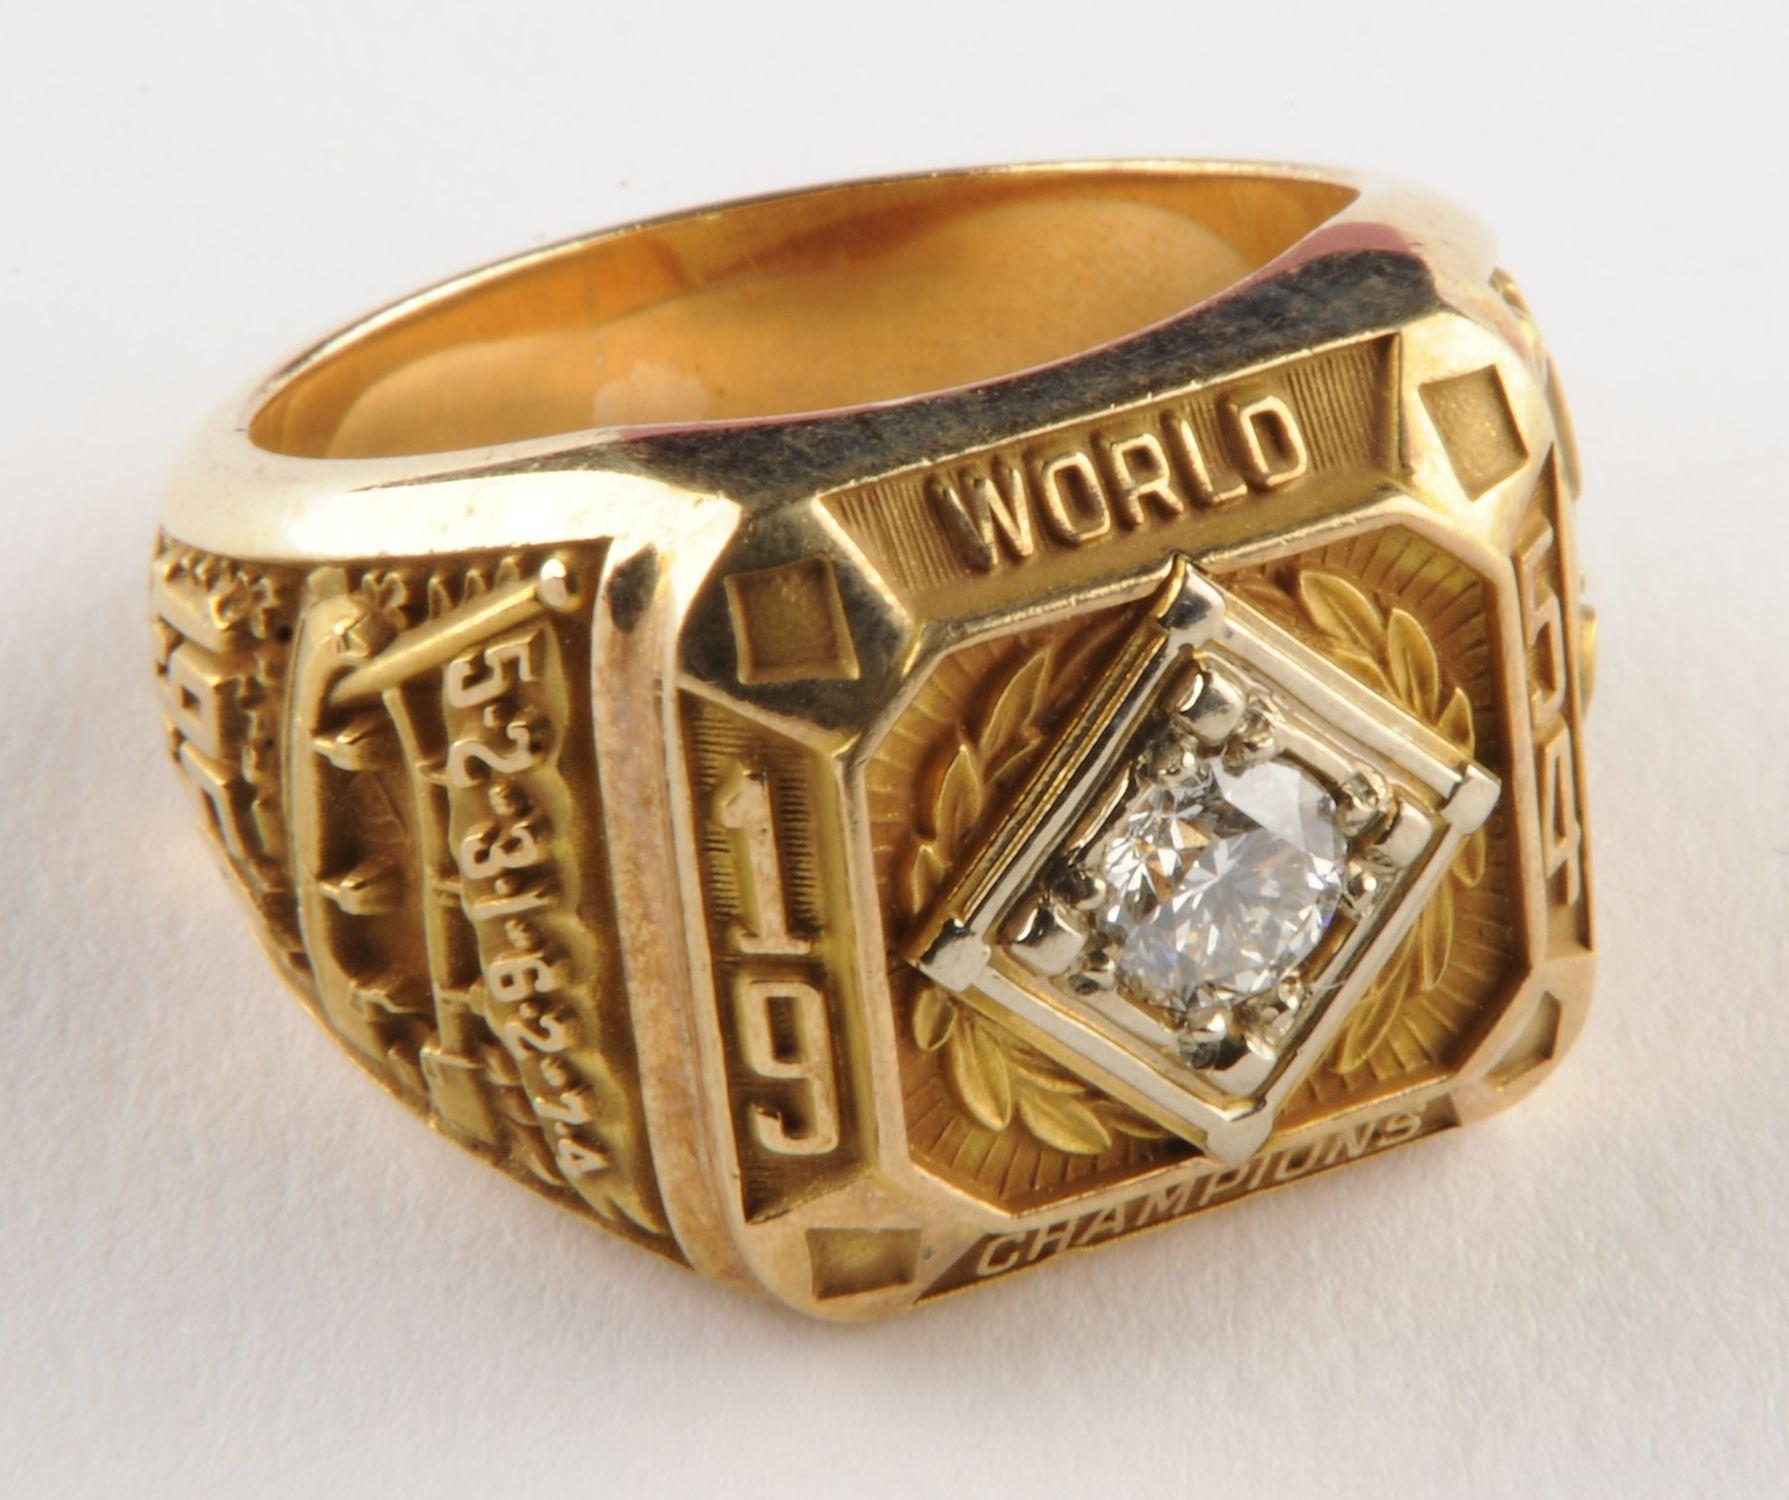 12f56ddc154 New York Giants 1954 Championship ring- B-68.55 (Milo Stewart